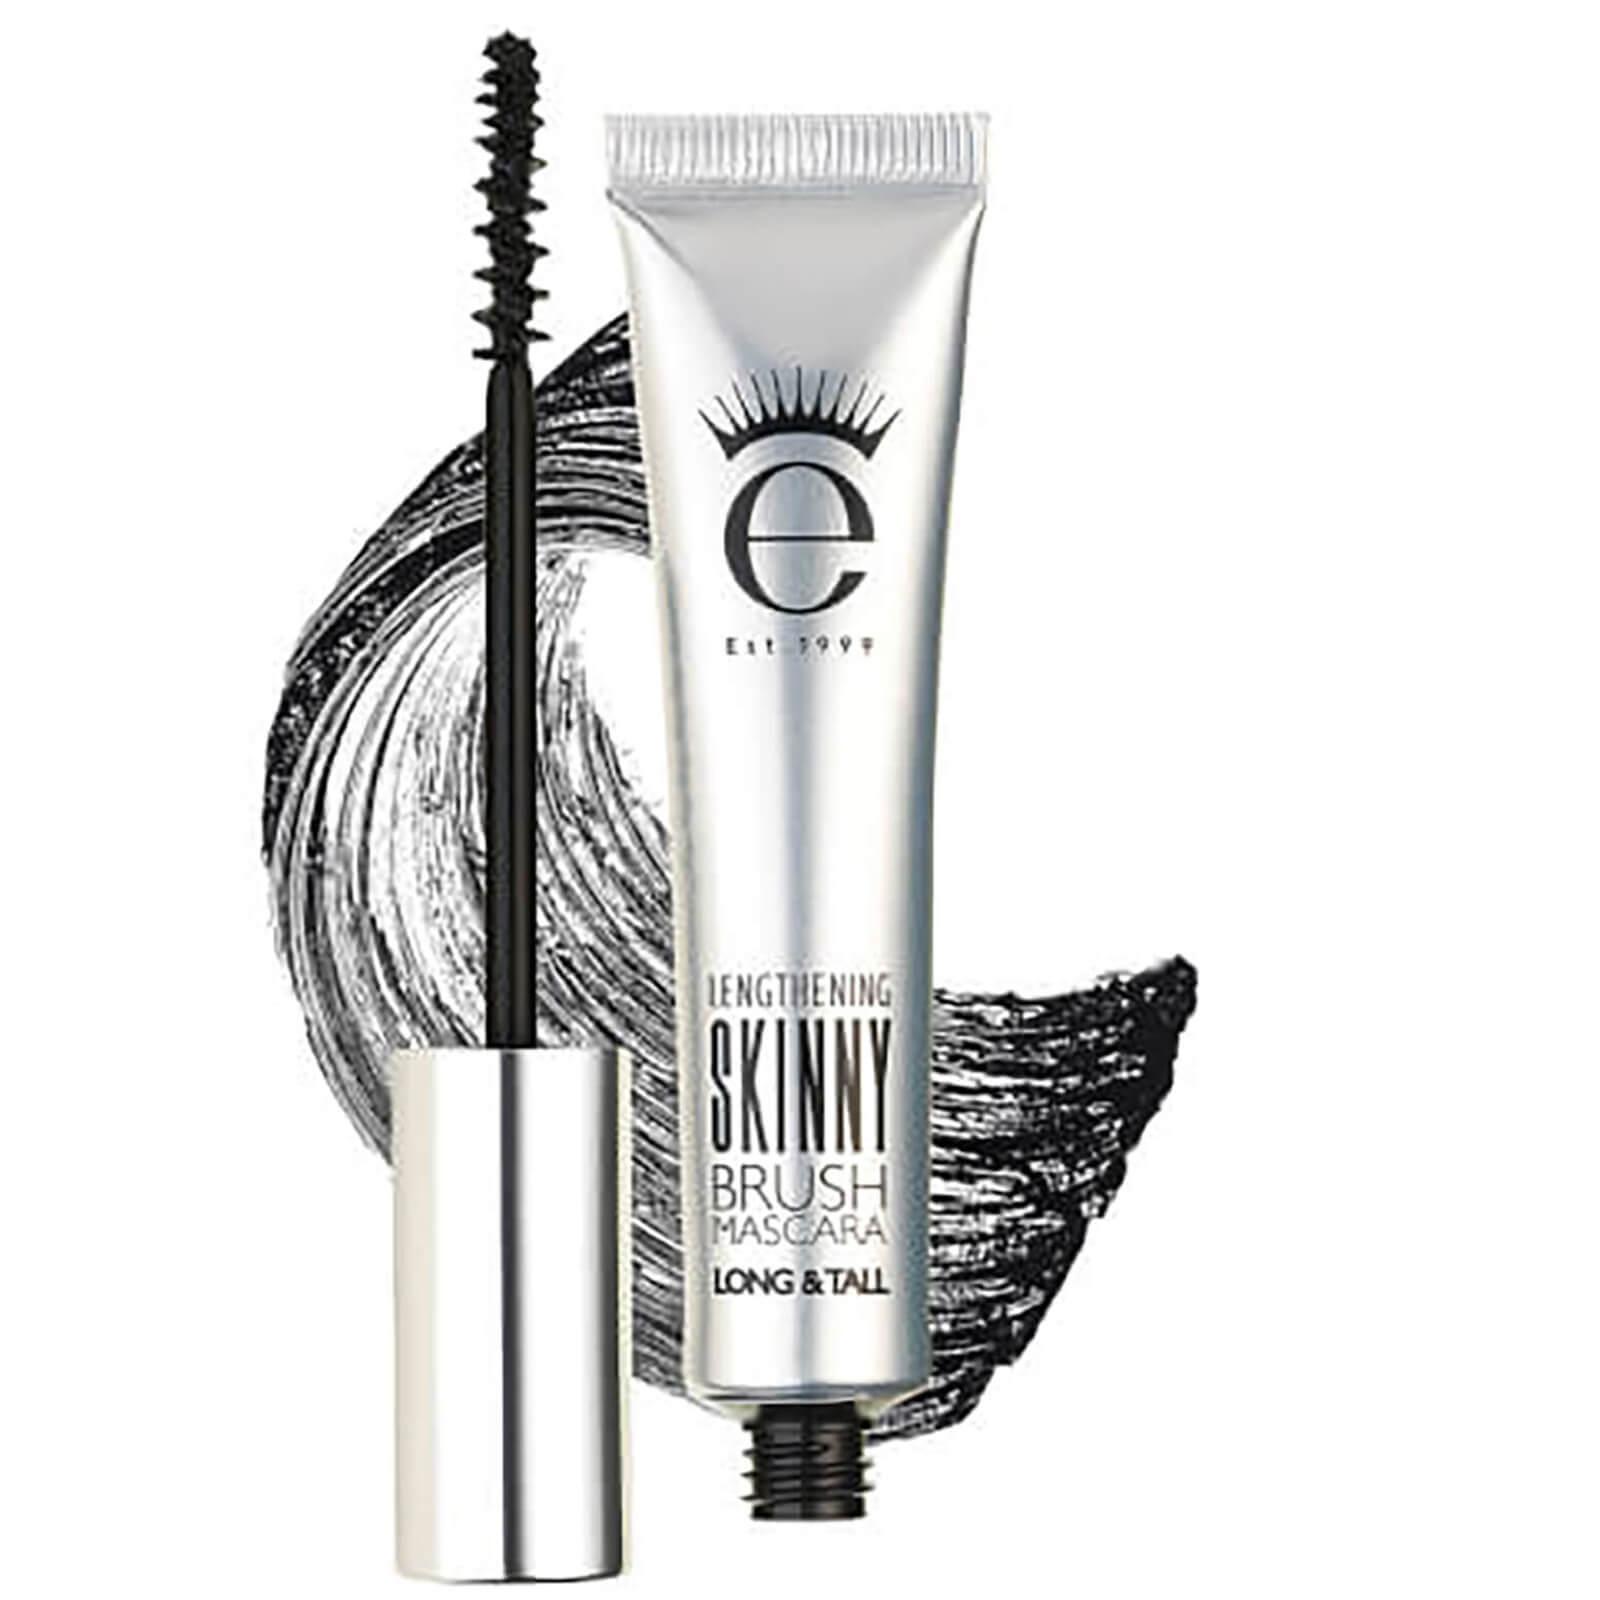 Eyeko Mascara Skinny Brush Eyeko - Noir